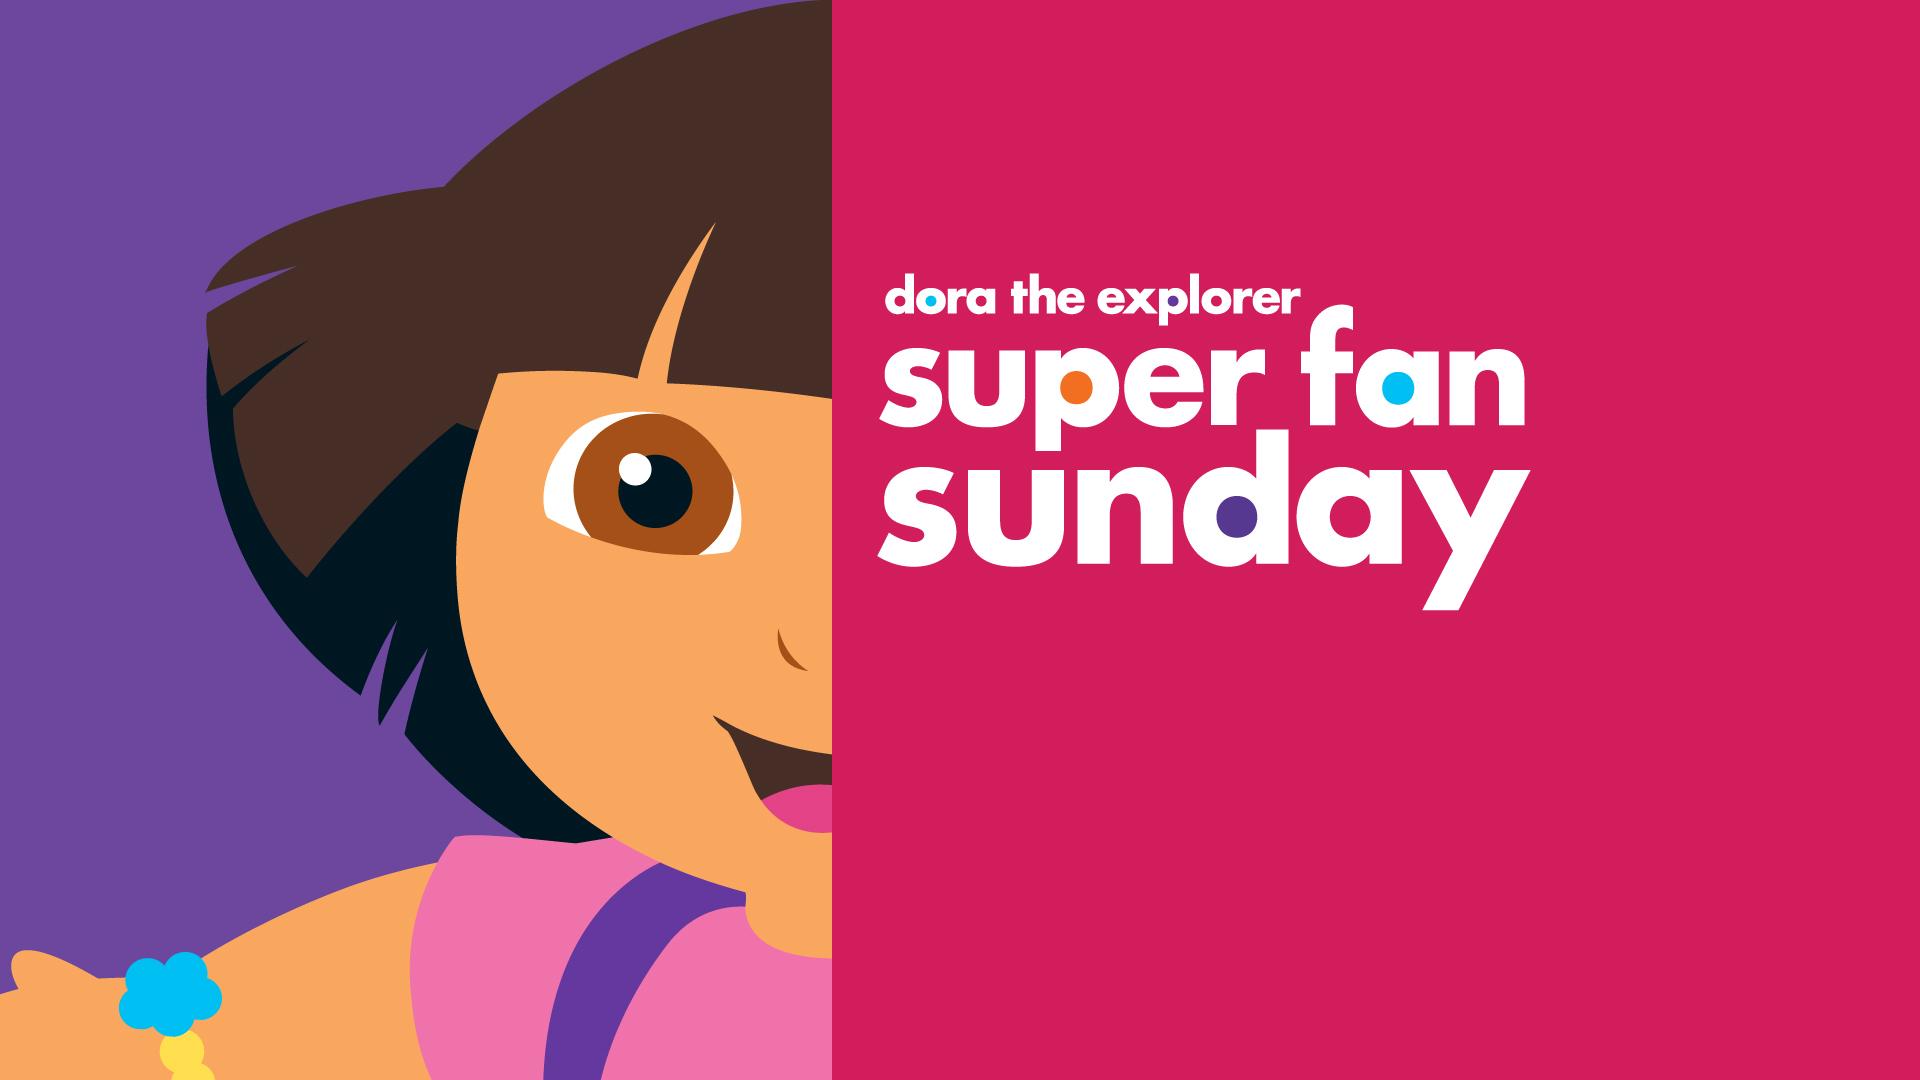 SuperFanSunday_DORA_Title.jpg